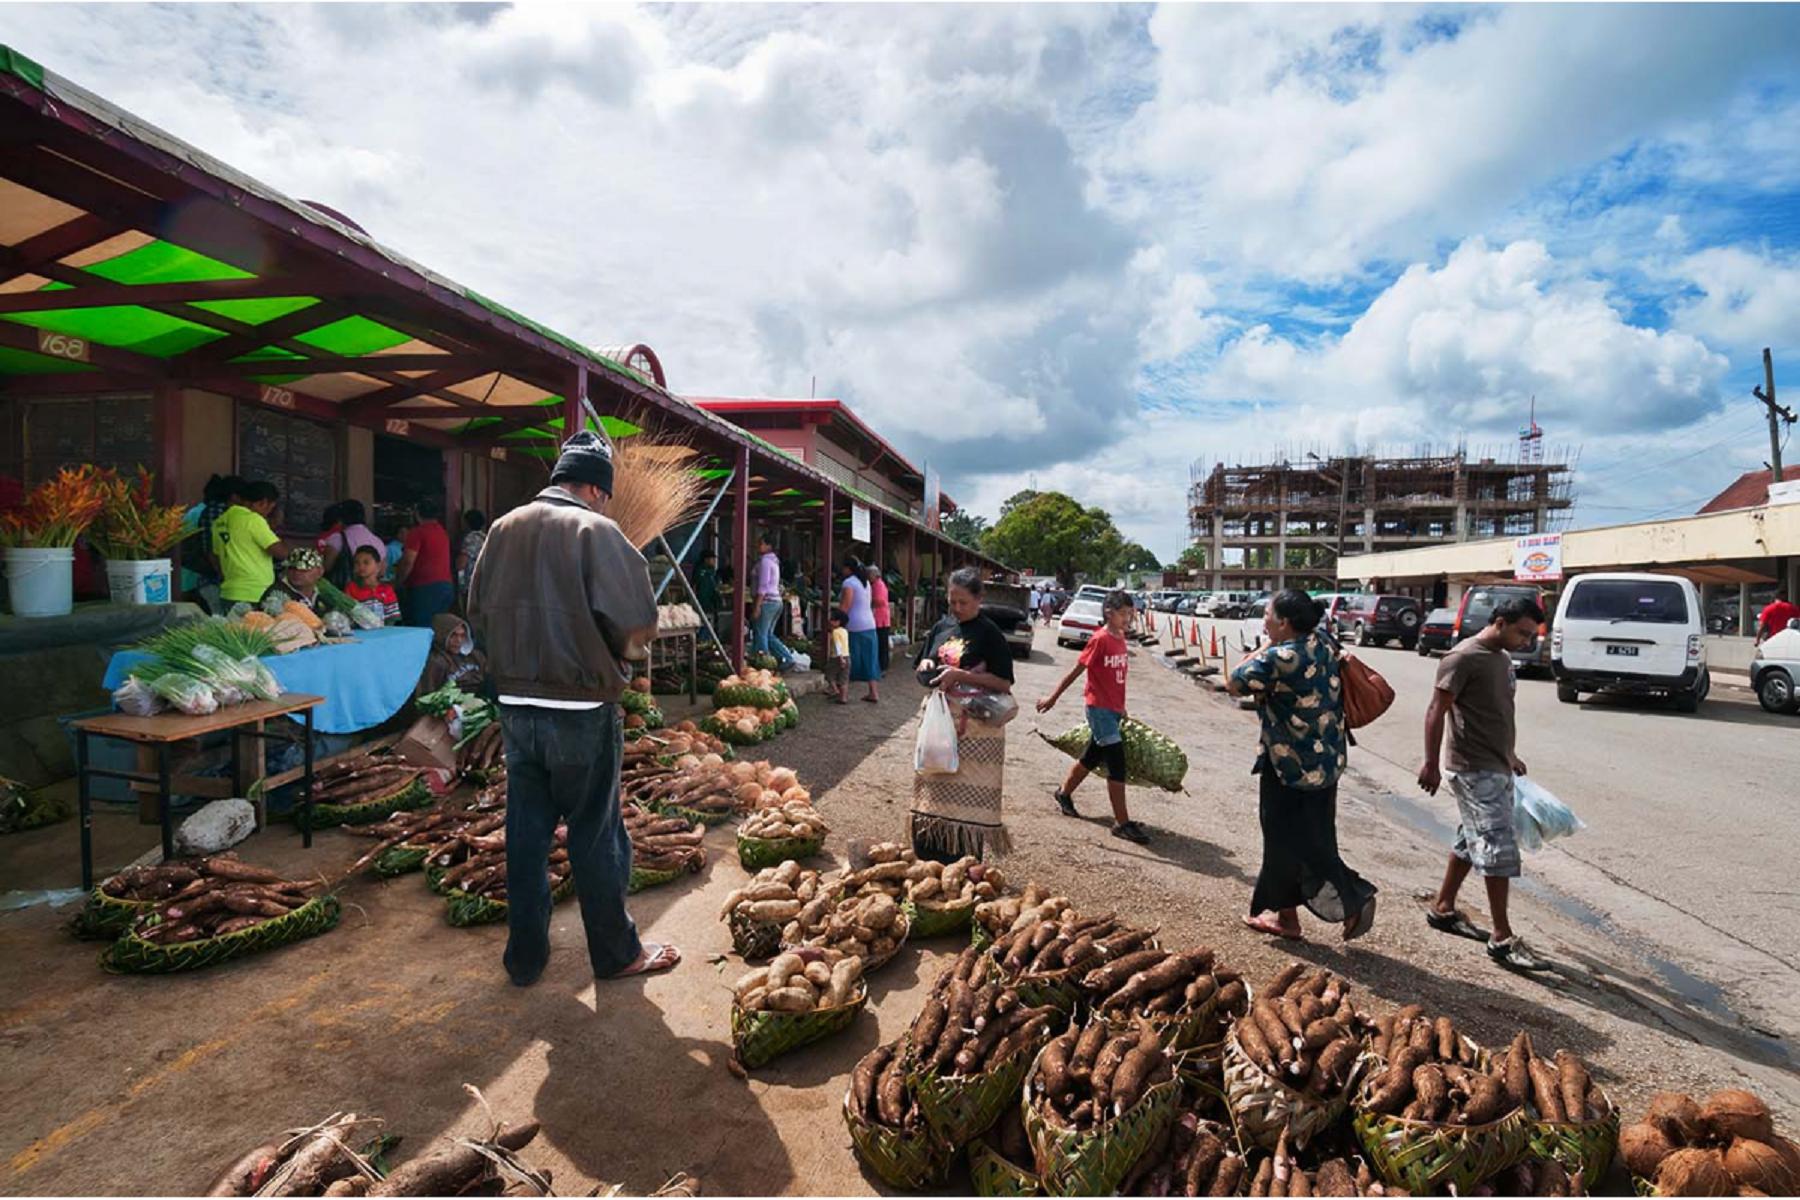 ilha tonga ruas carros comercios